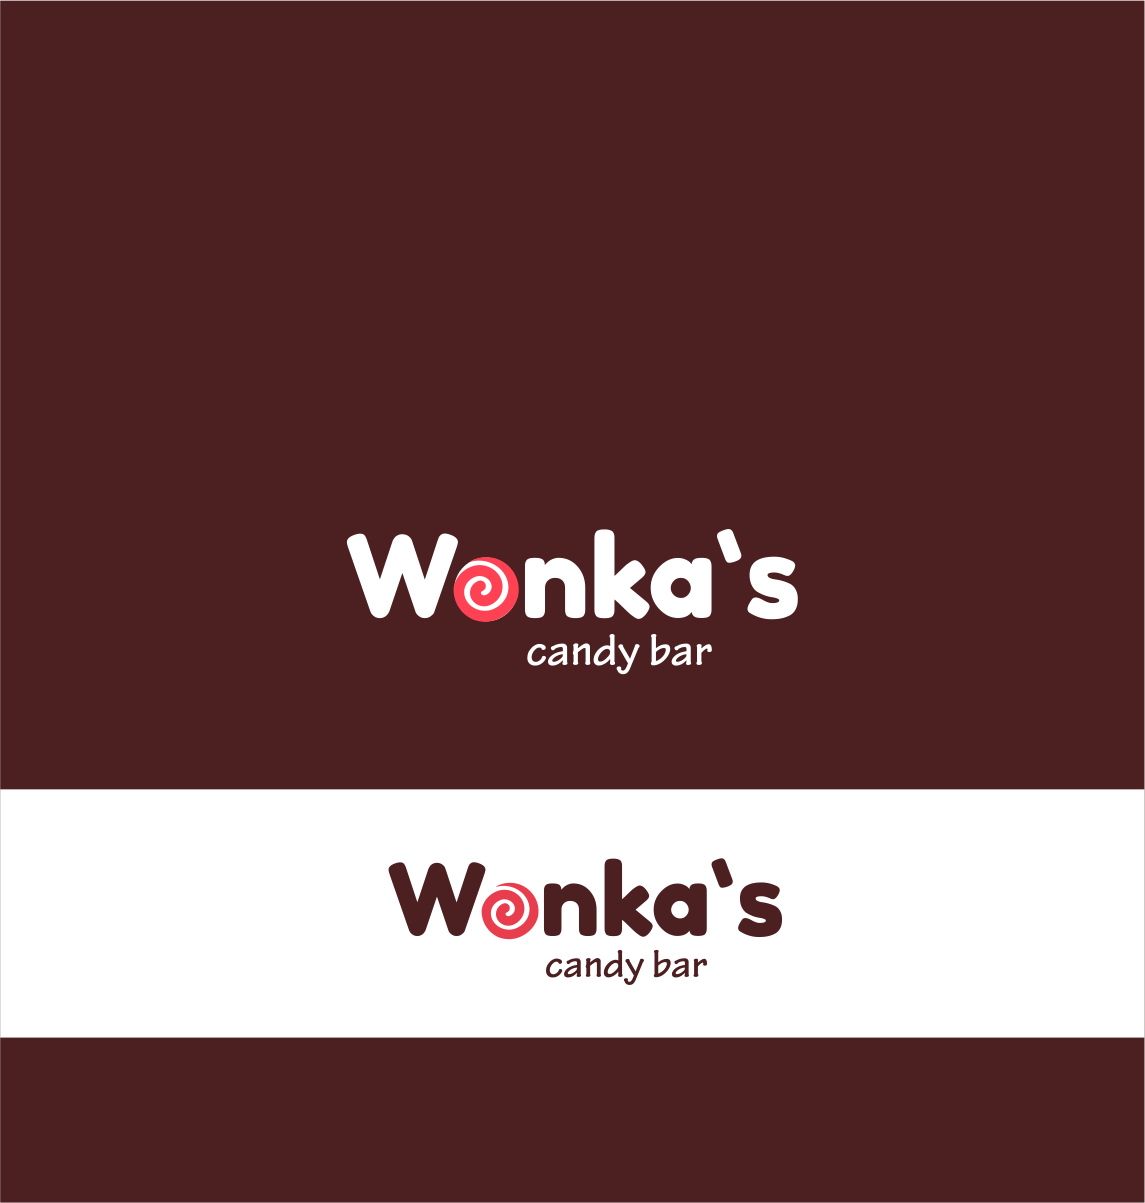 Разработка логотипа магазина сладостей со всего мира. фото f_5885a29d53fe1350.png